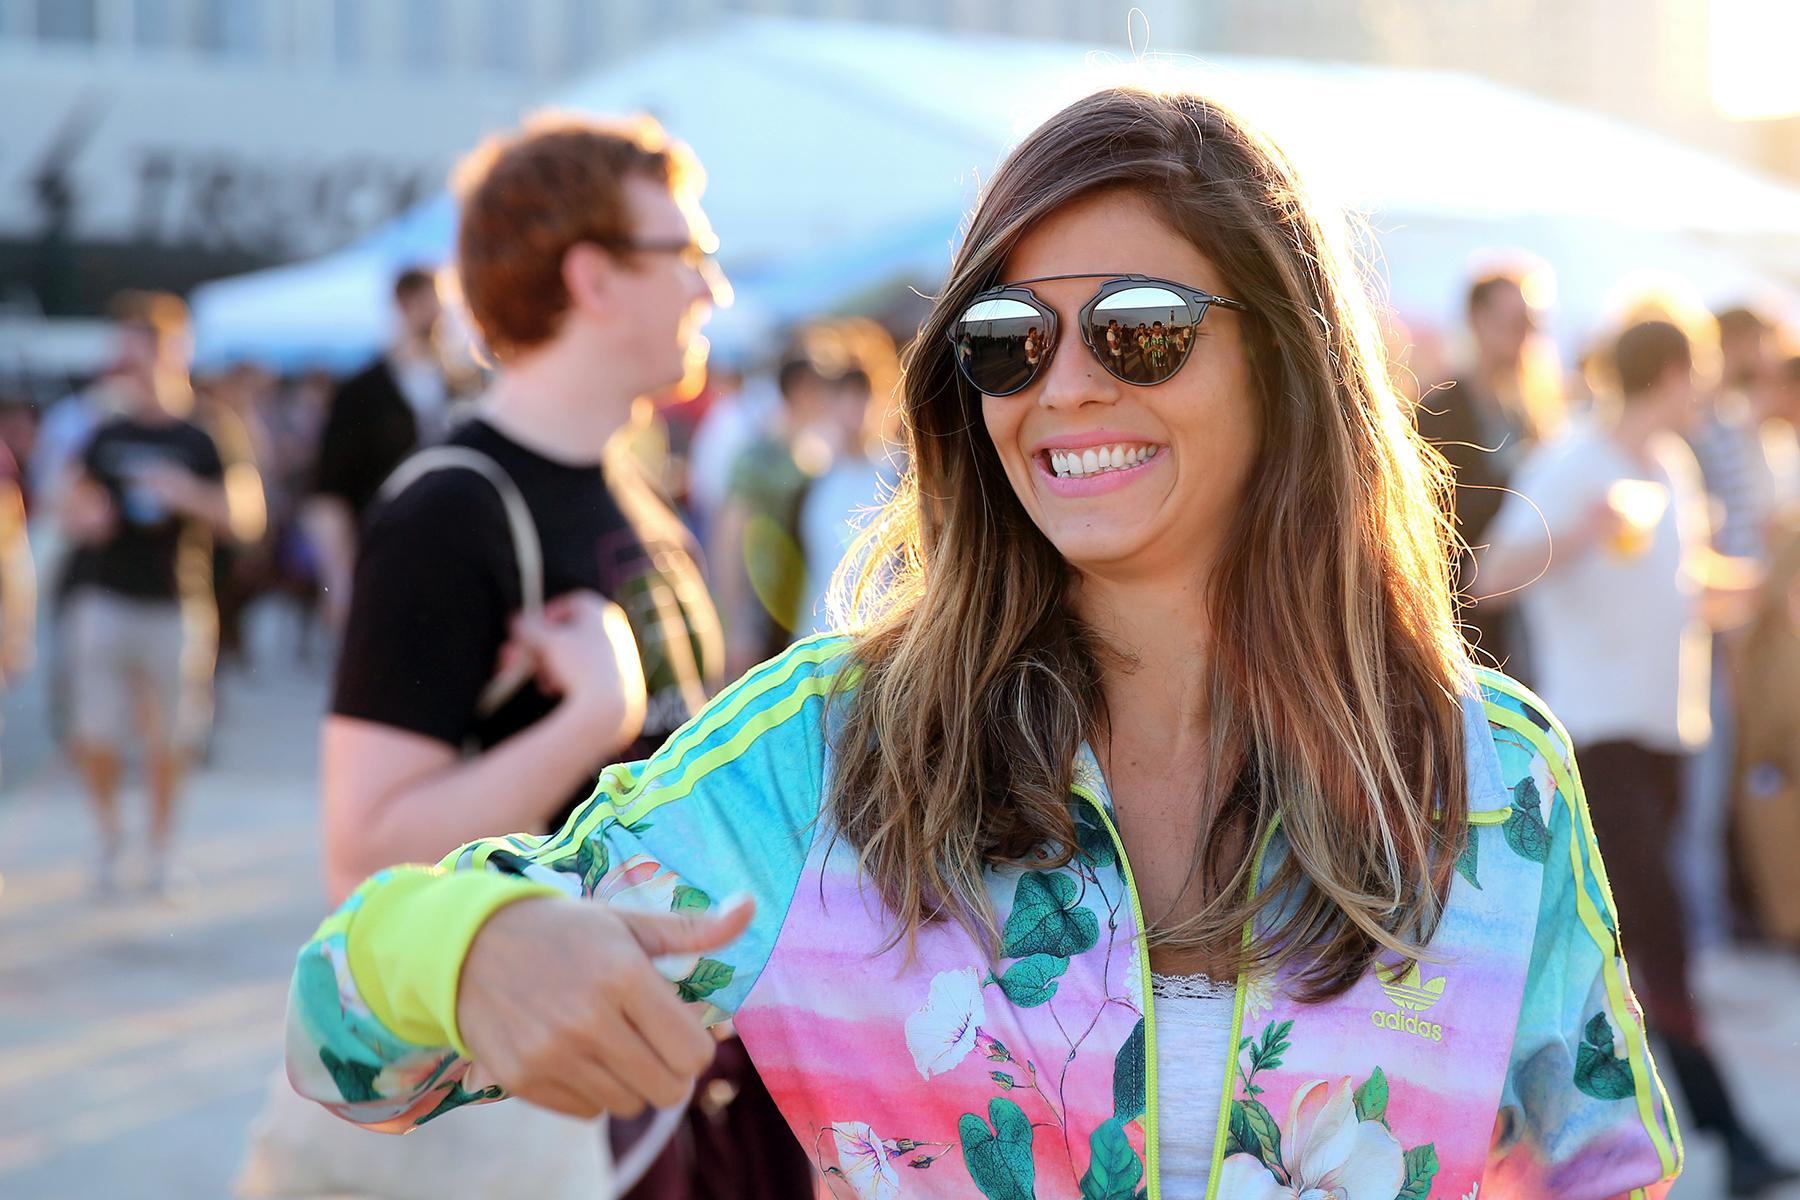 trendy_taste-look-outfit-street_style-ootd-blog-blogger_españa-fashion_spain-moda_españa-festival-primavera_sound-adidas_originals-stan_smith-barcelona-camiseta-zapas-6